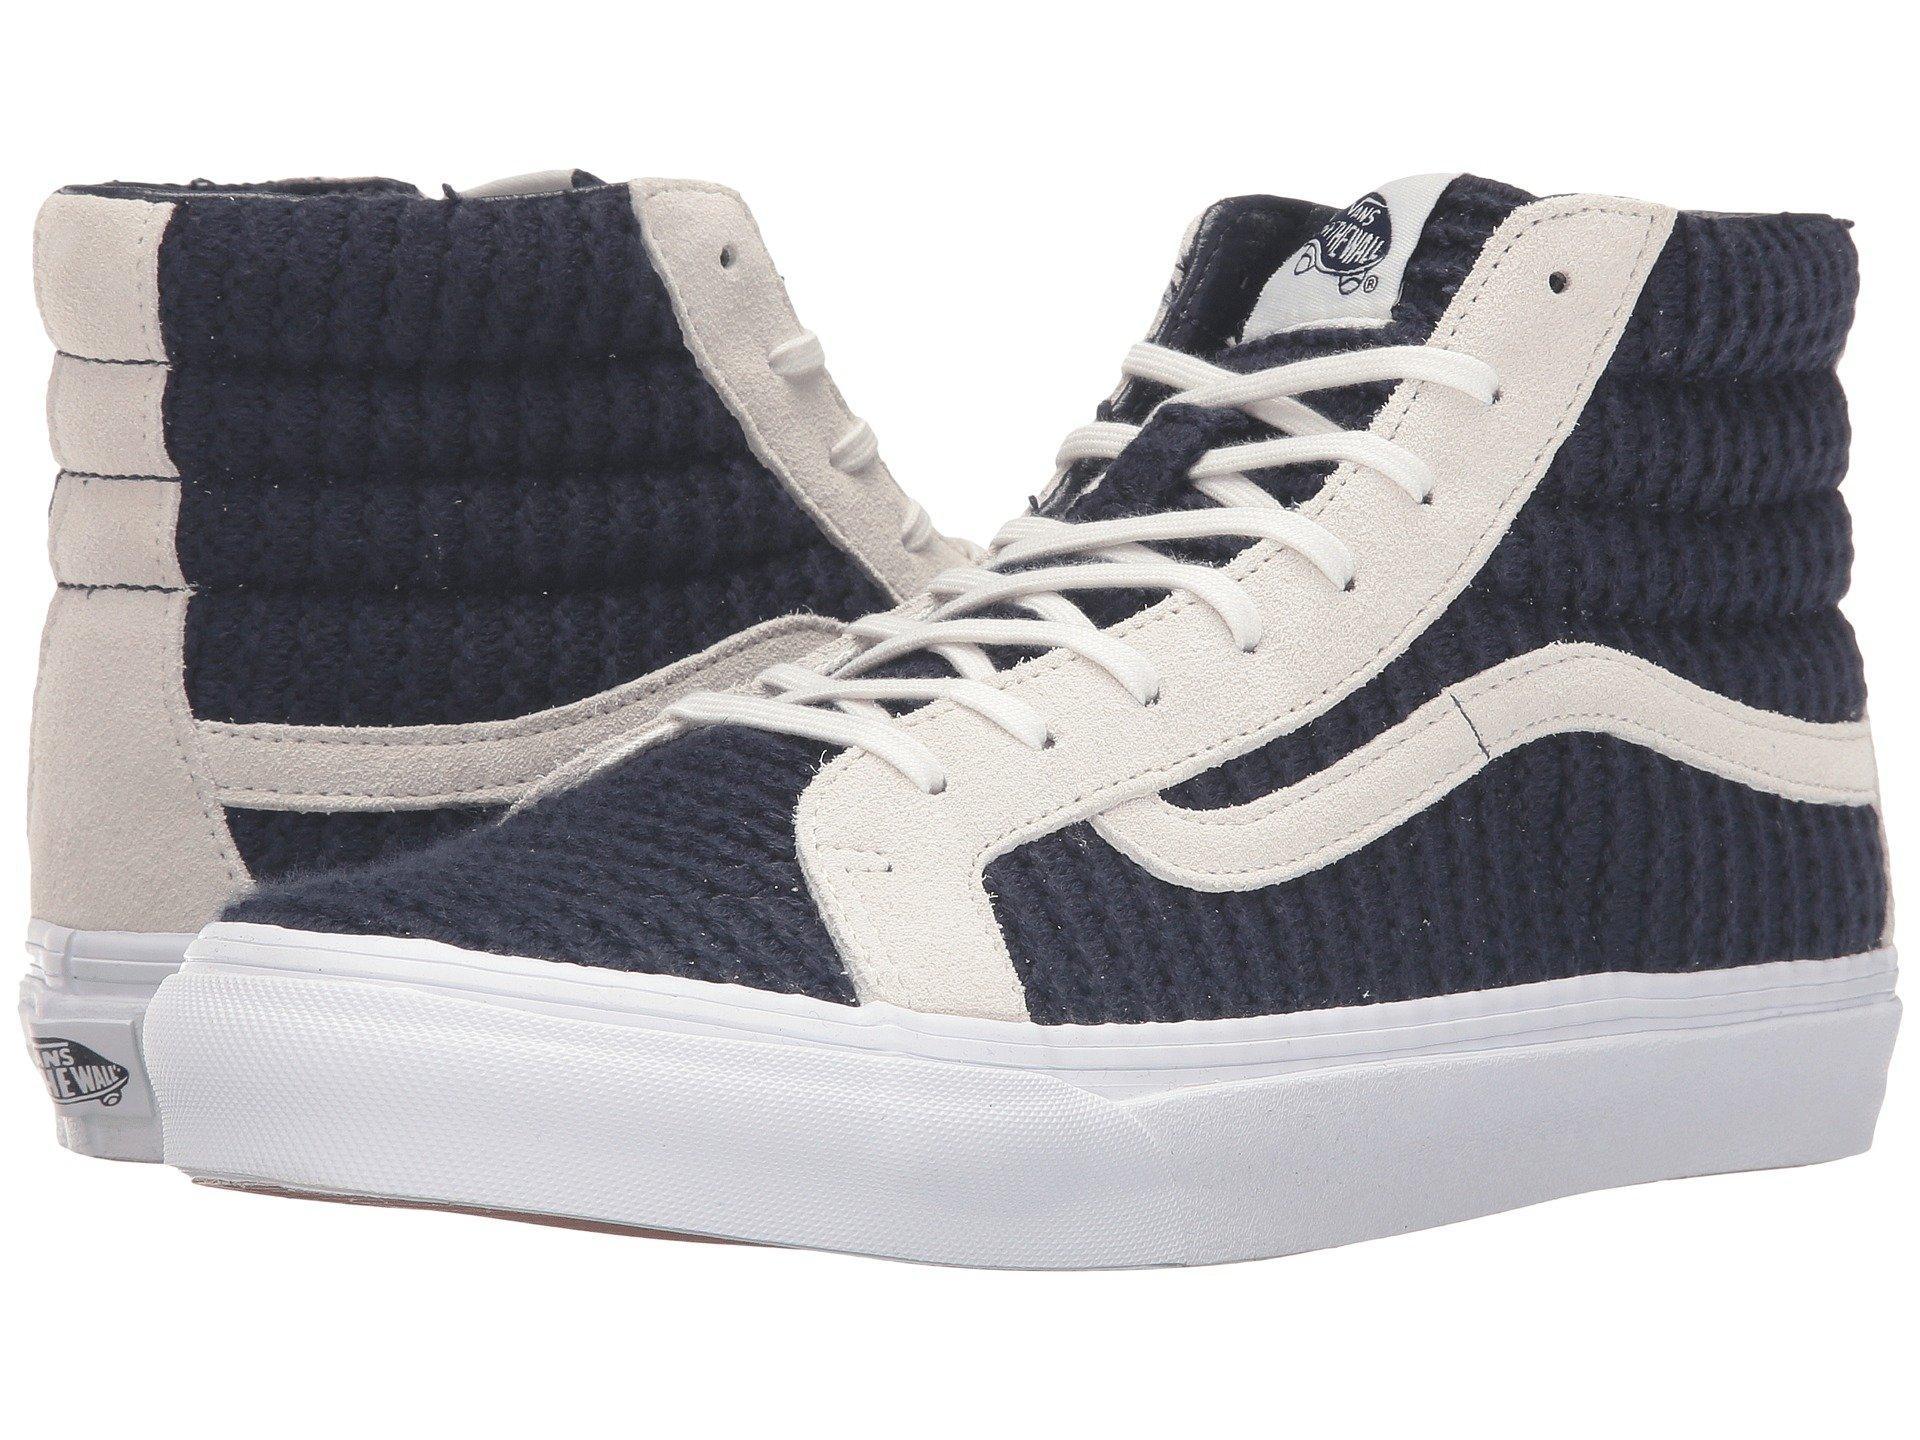 926713e07984dc Vans Sk8-Hi Slim In (Suede Woven) Navy Blue True White